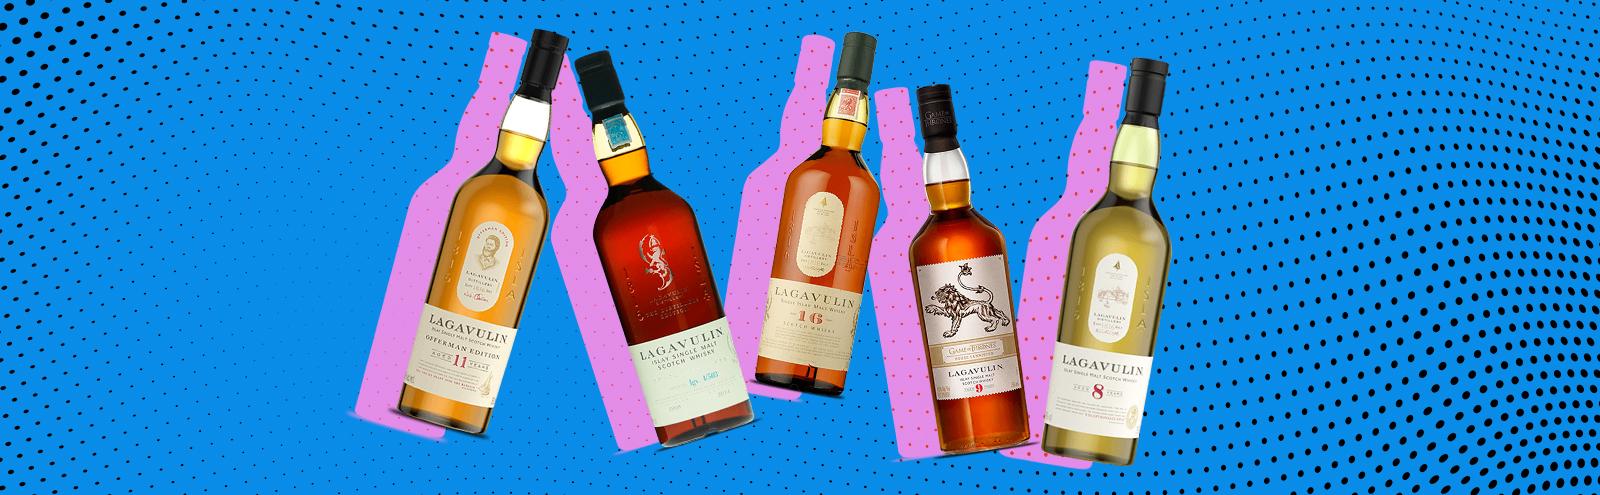 Ranking The Core Line Of Lagavulin Single Malt Scotch Whiskies